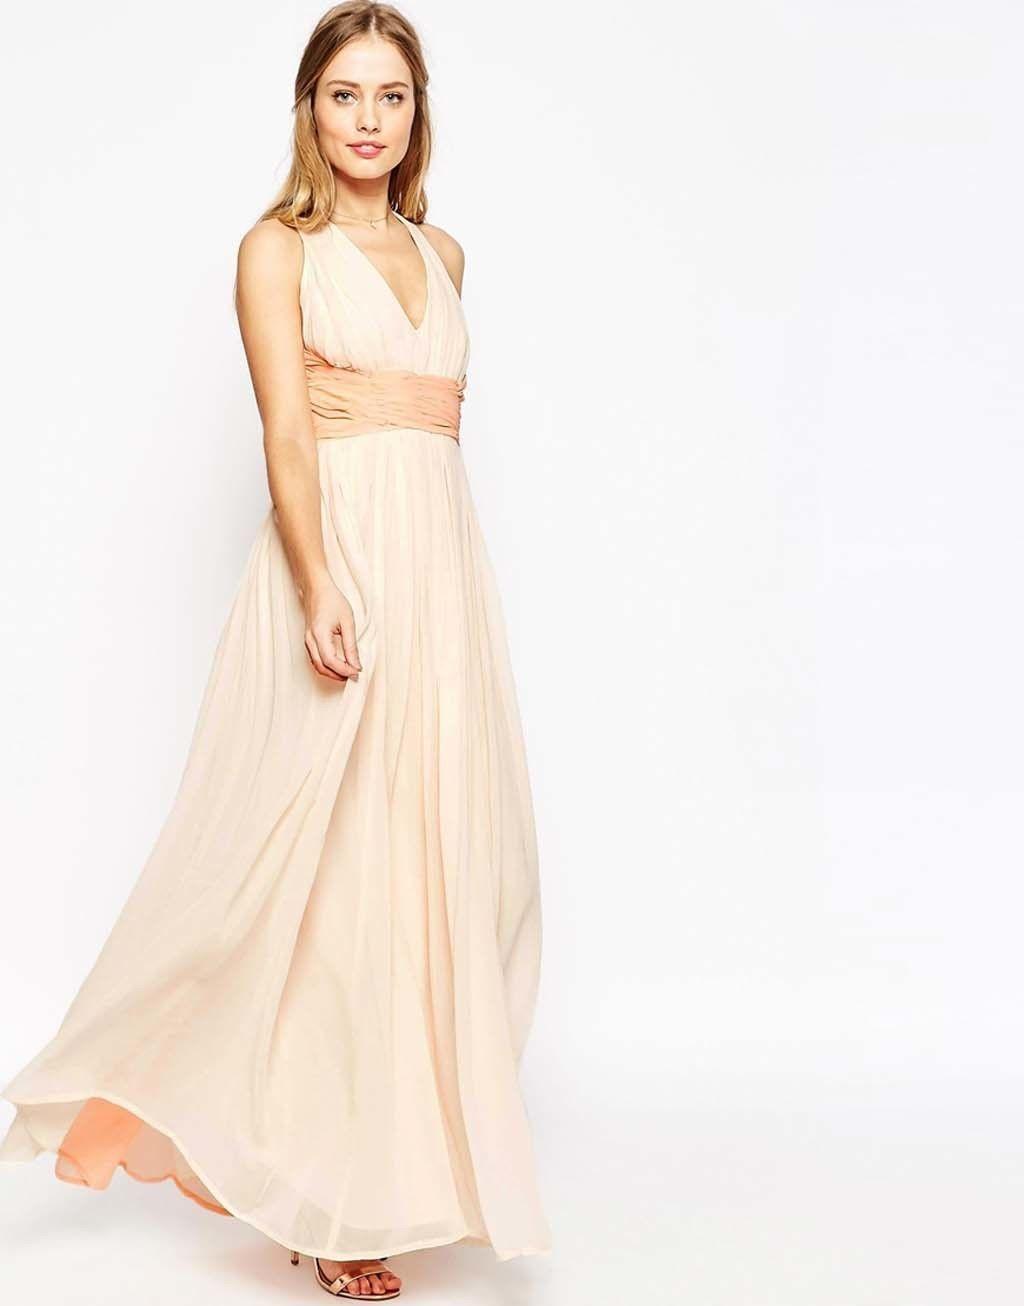 28 vestidos de novia por menos de 100€